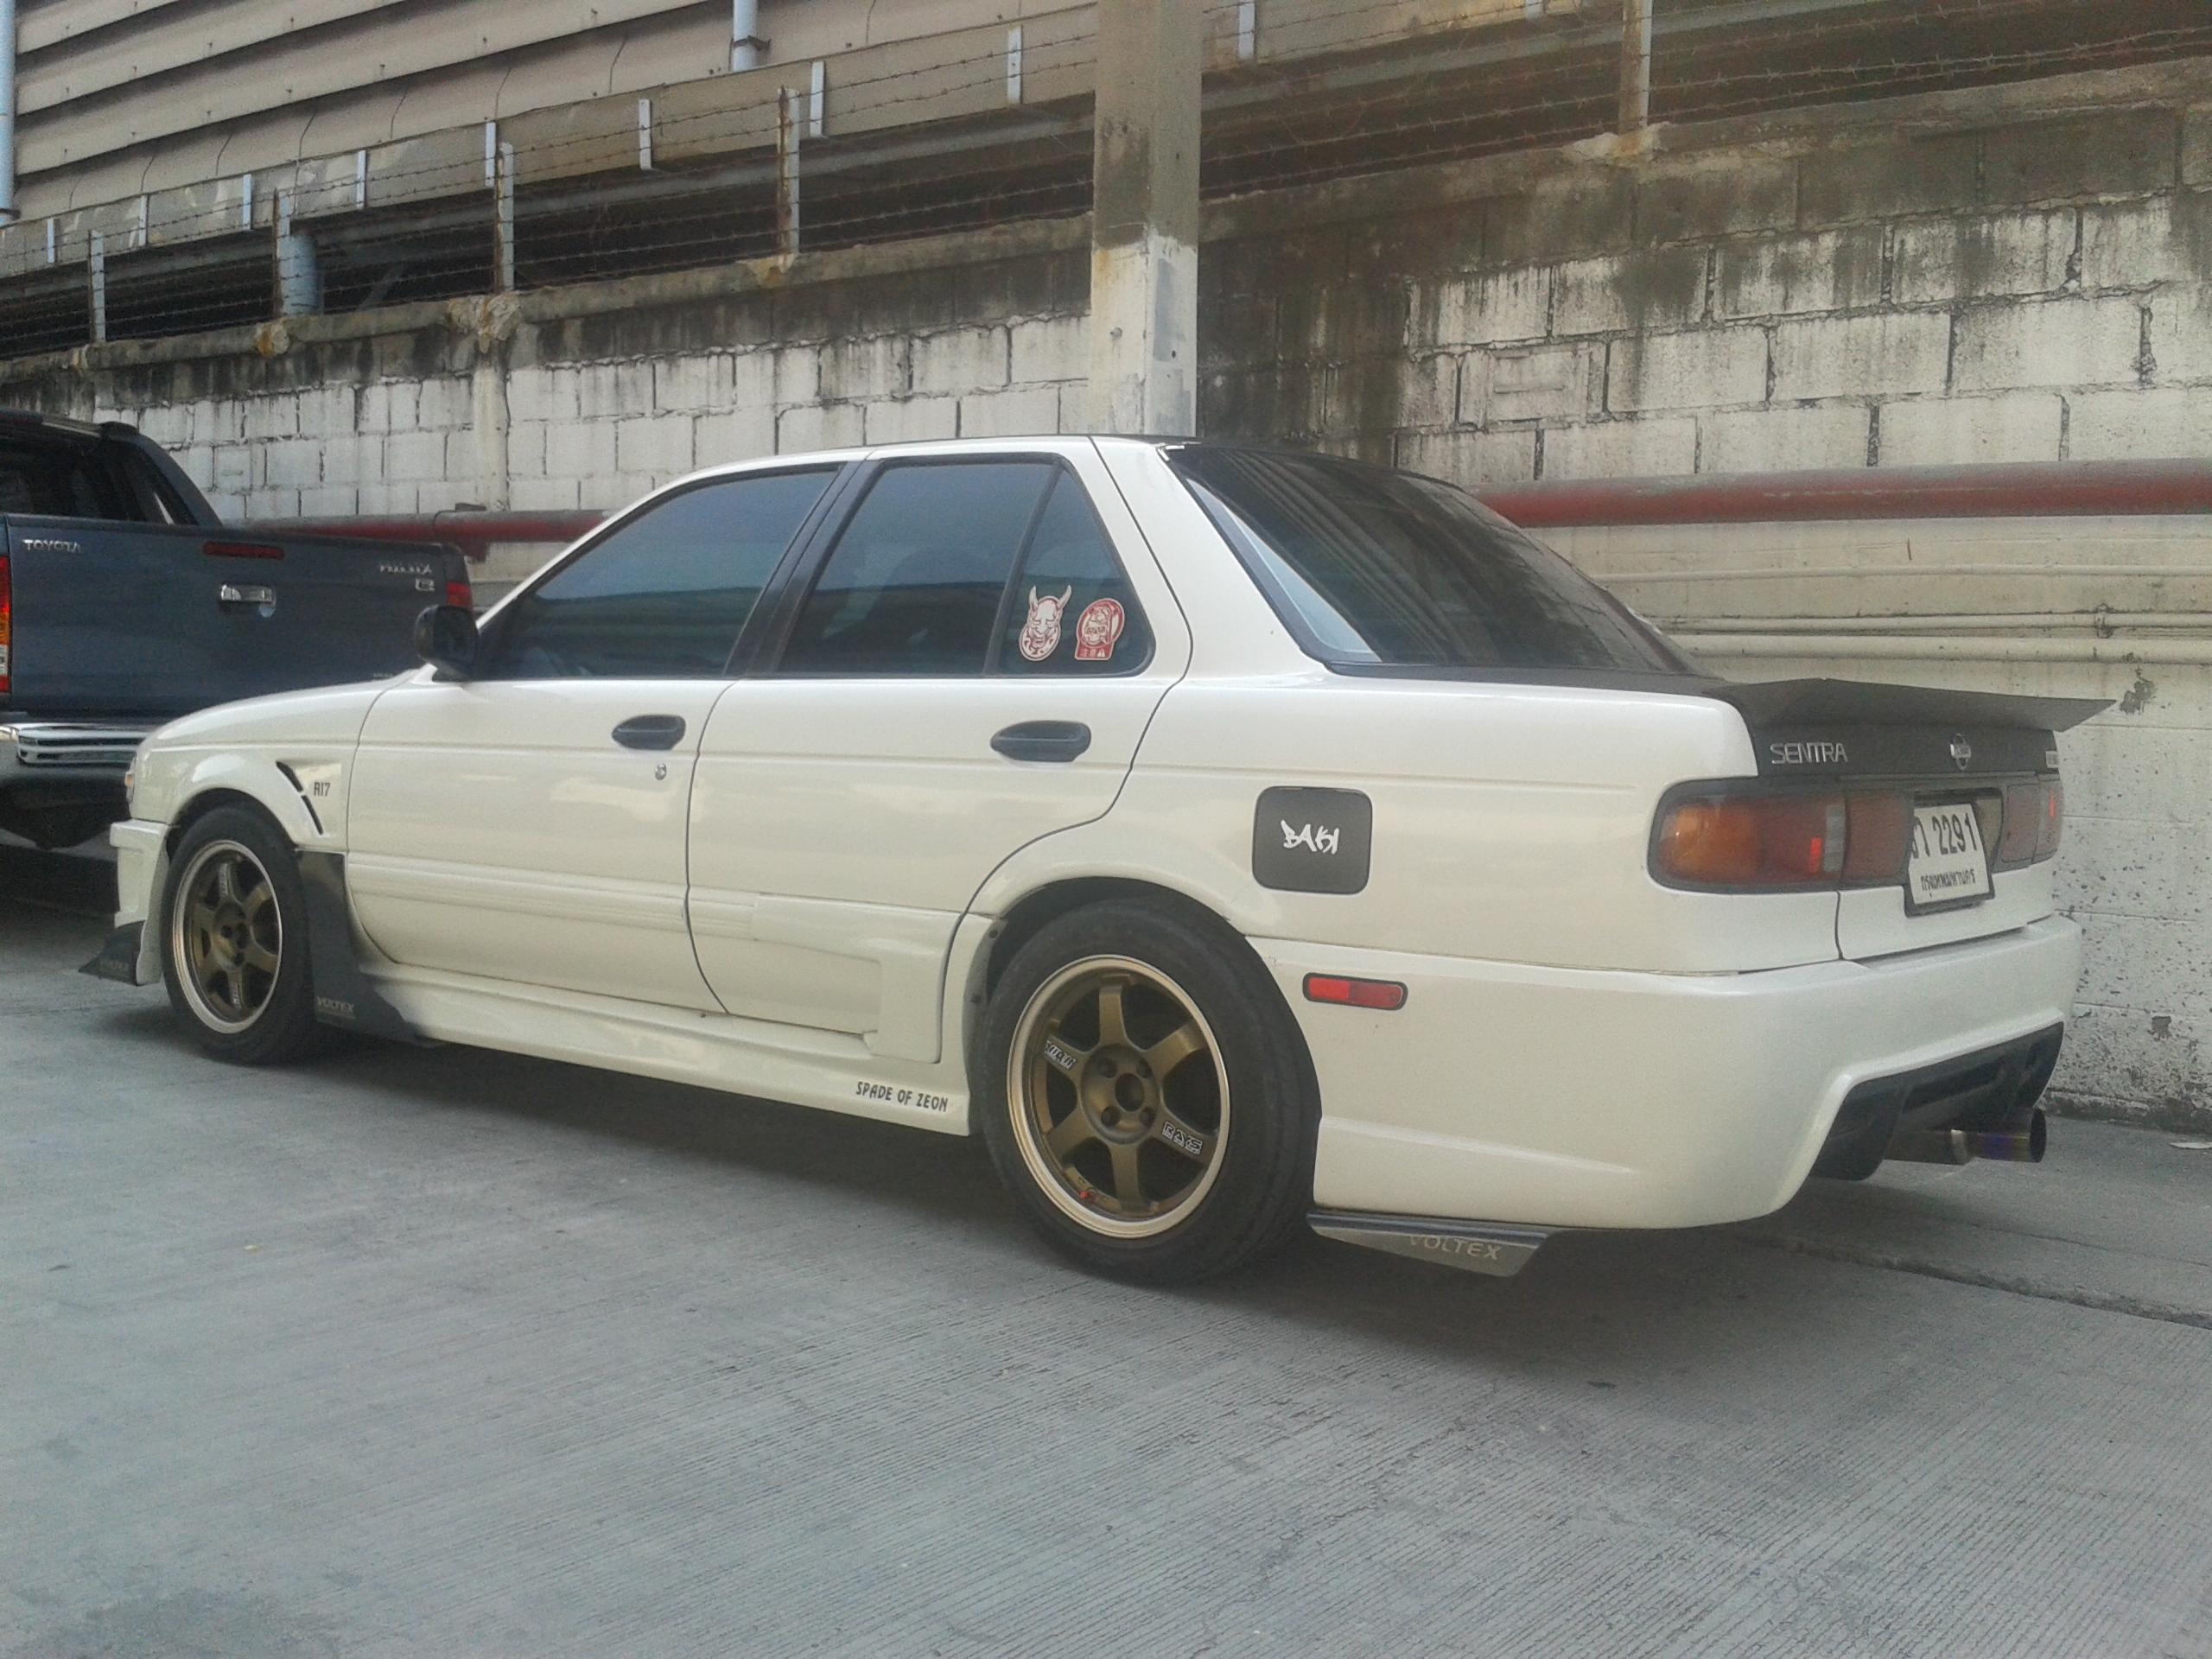 File:Tuned Nissan Sentra (B13) in Thailand 03.jpg ...